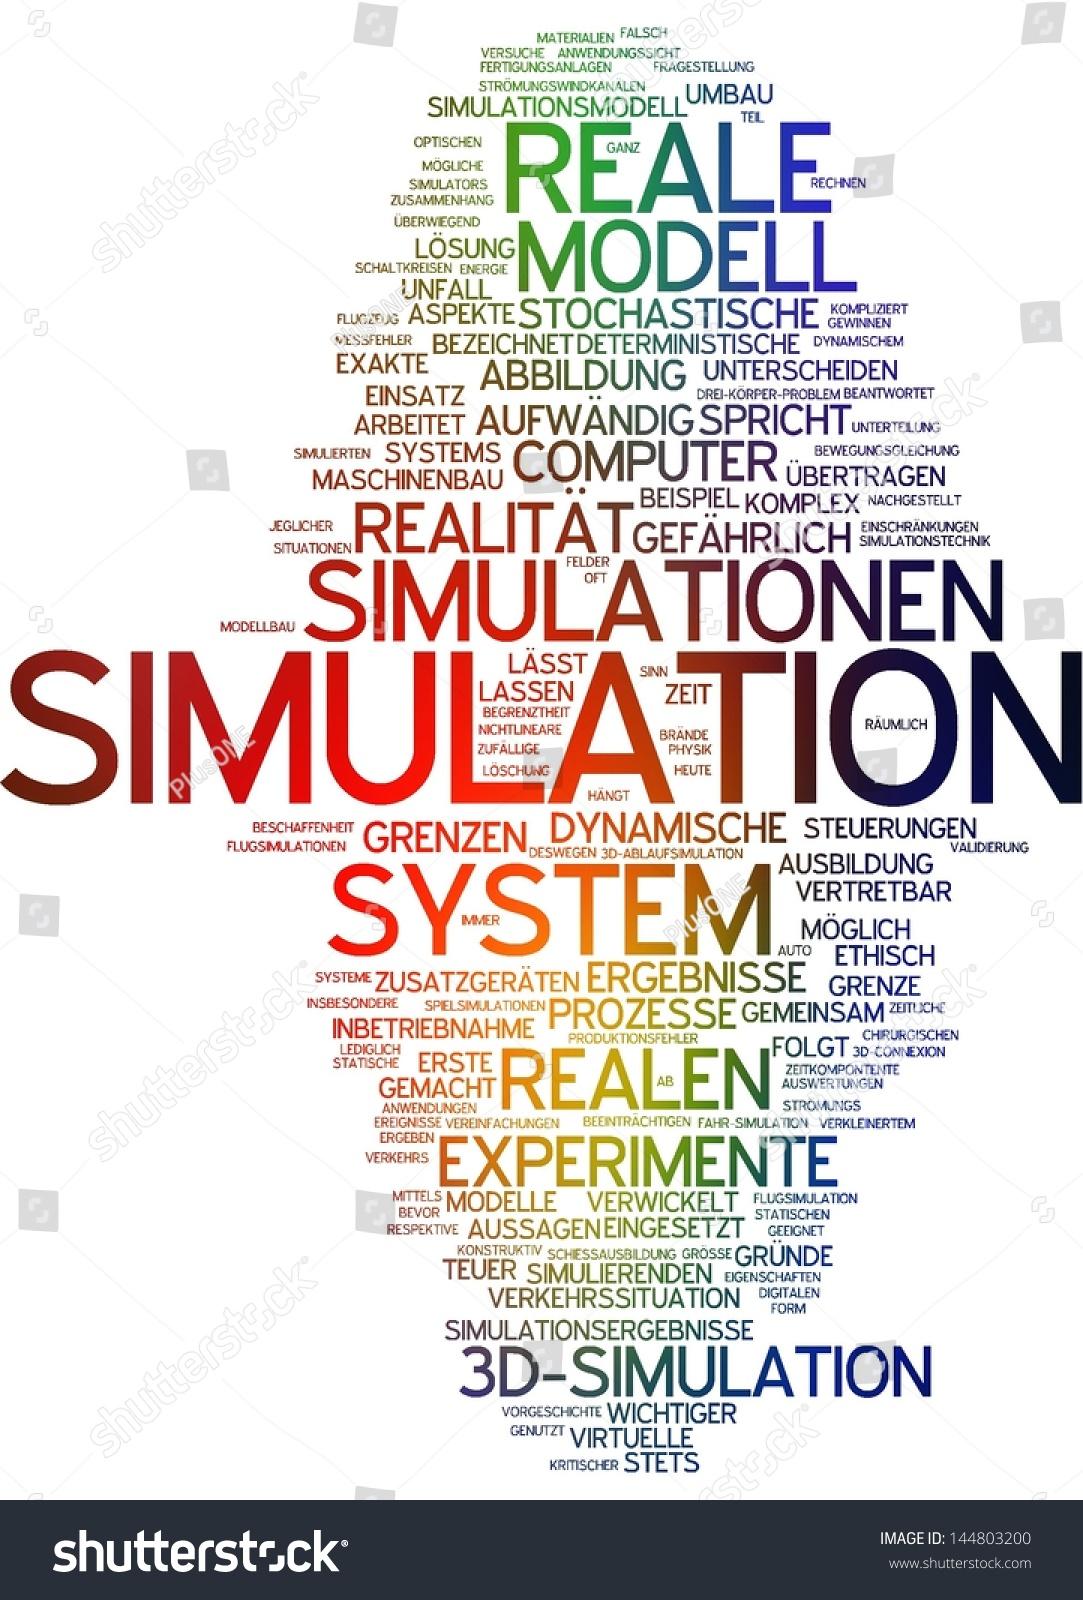 Großartig Unfall Simulation Fotos - Elektrische Schaltplan-Ideen ...